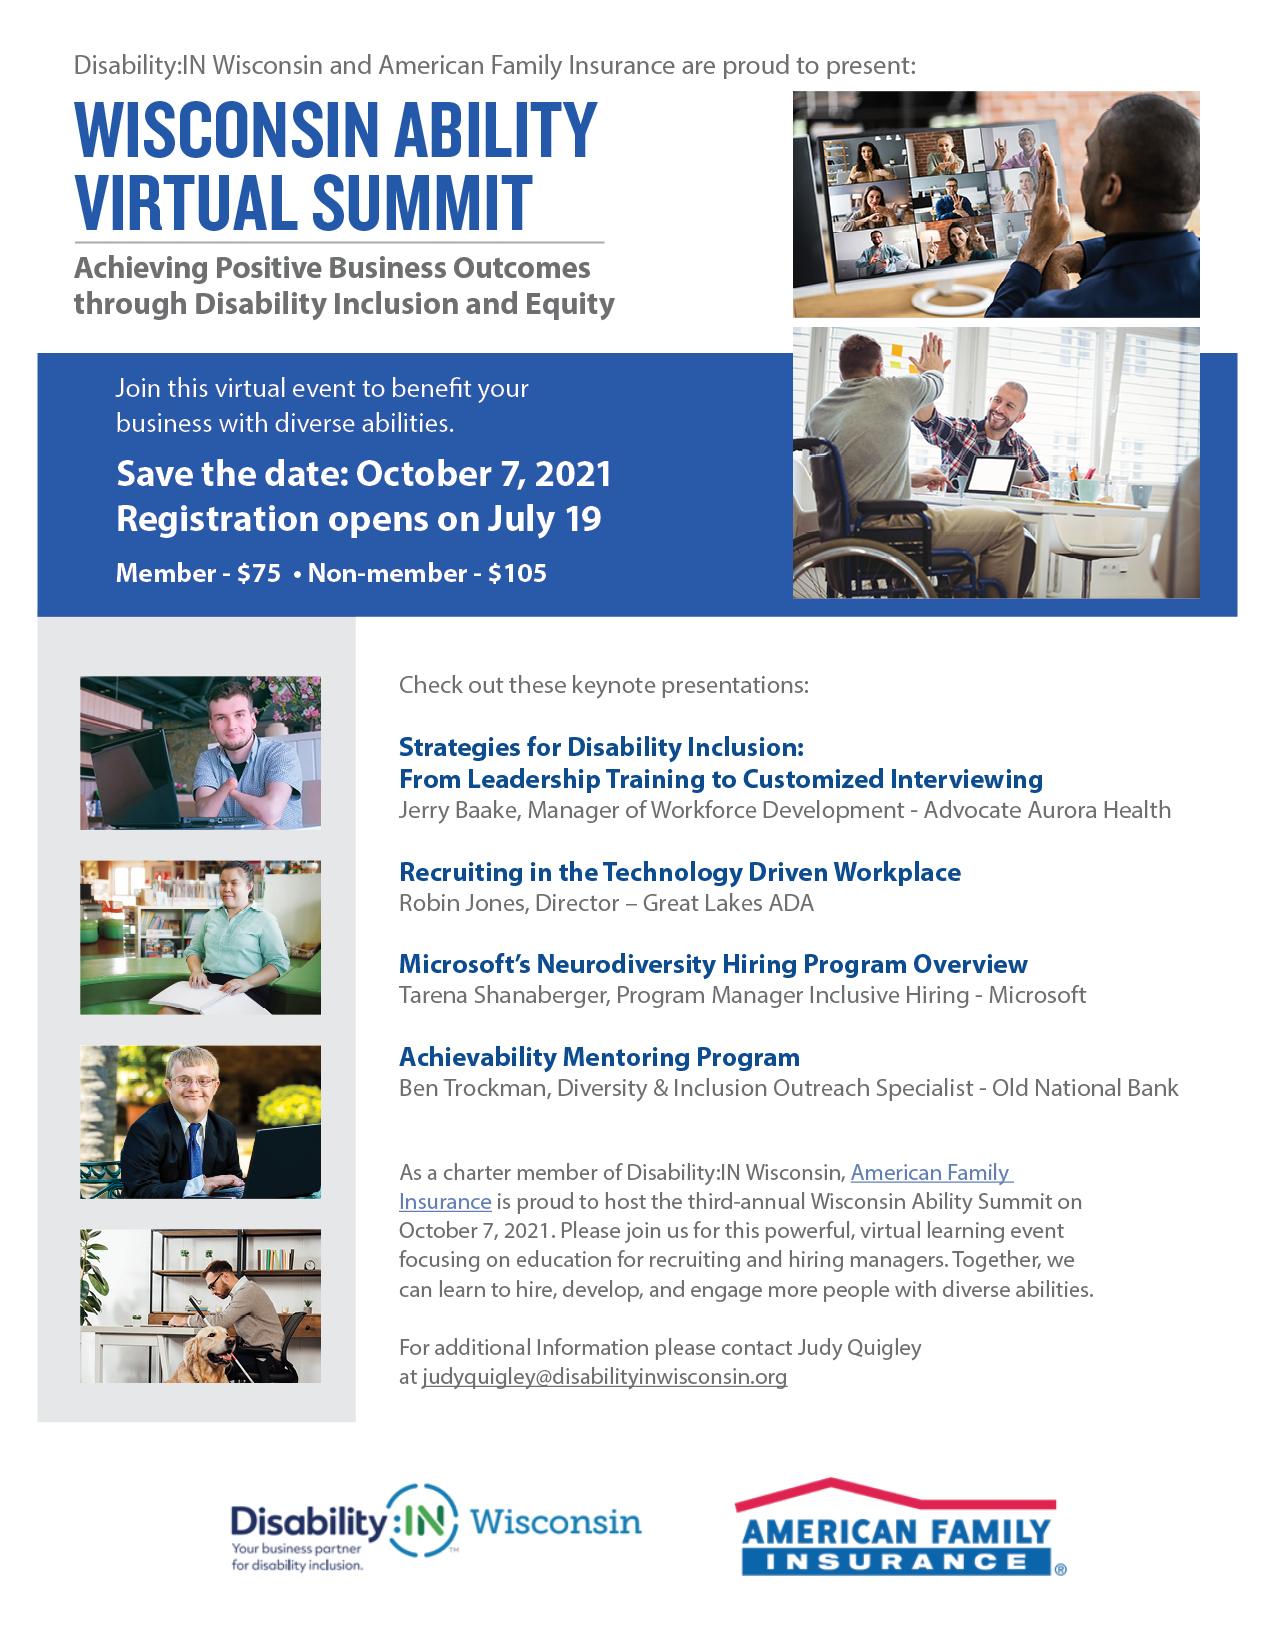 Wisconsin Ability Summit flyer